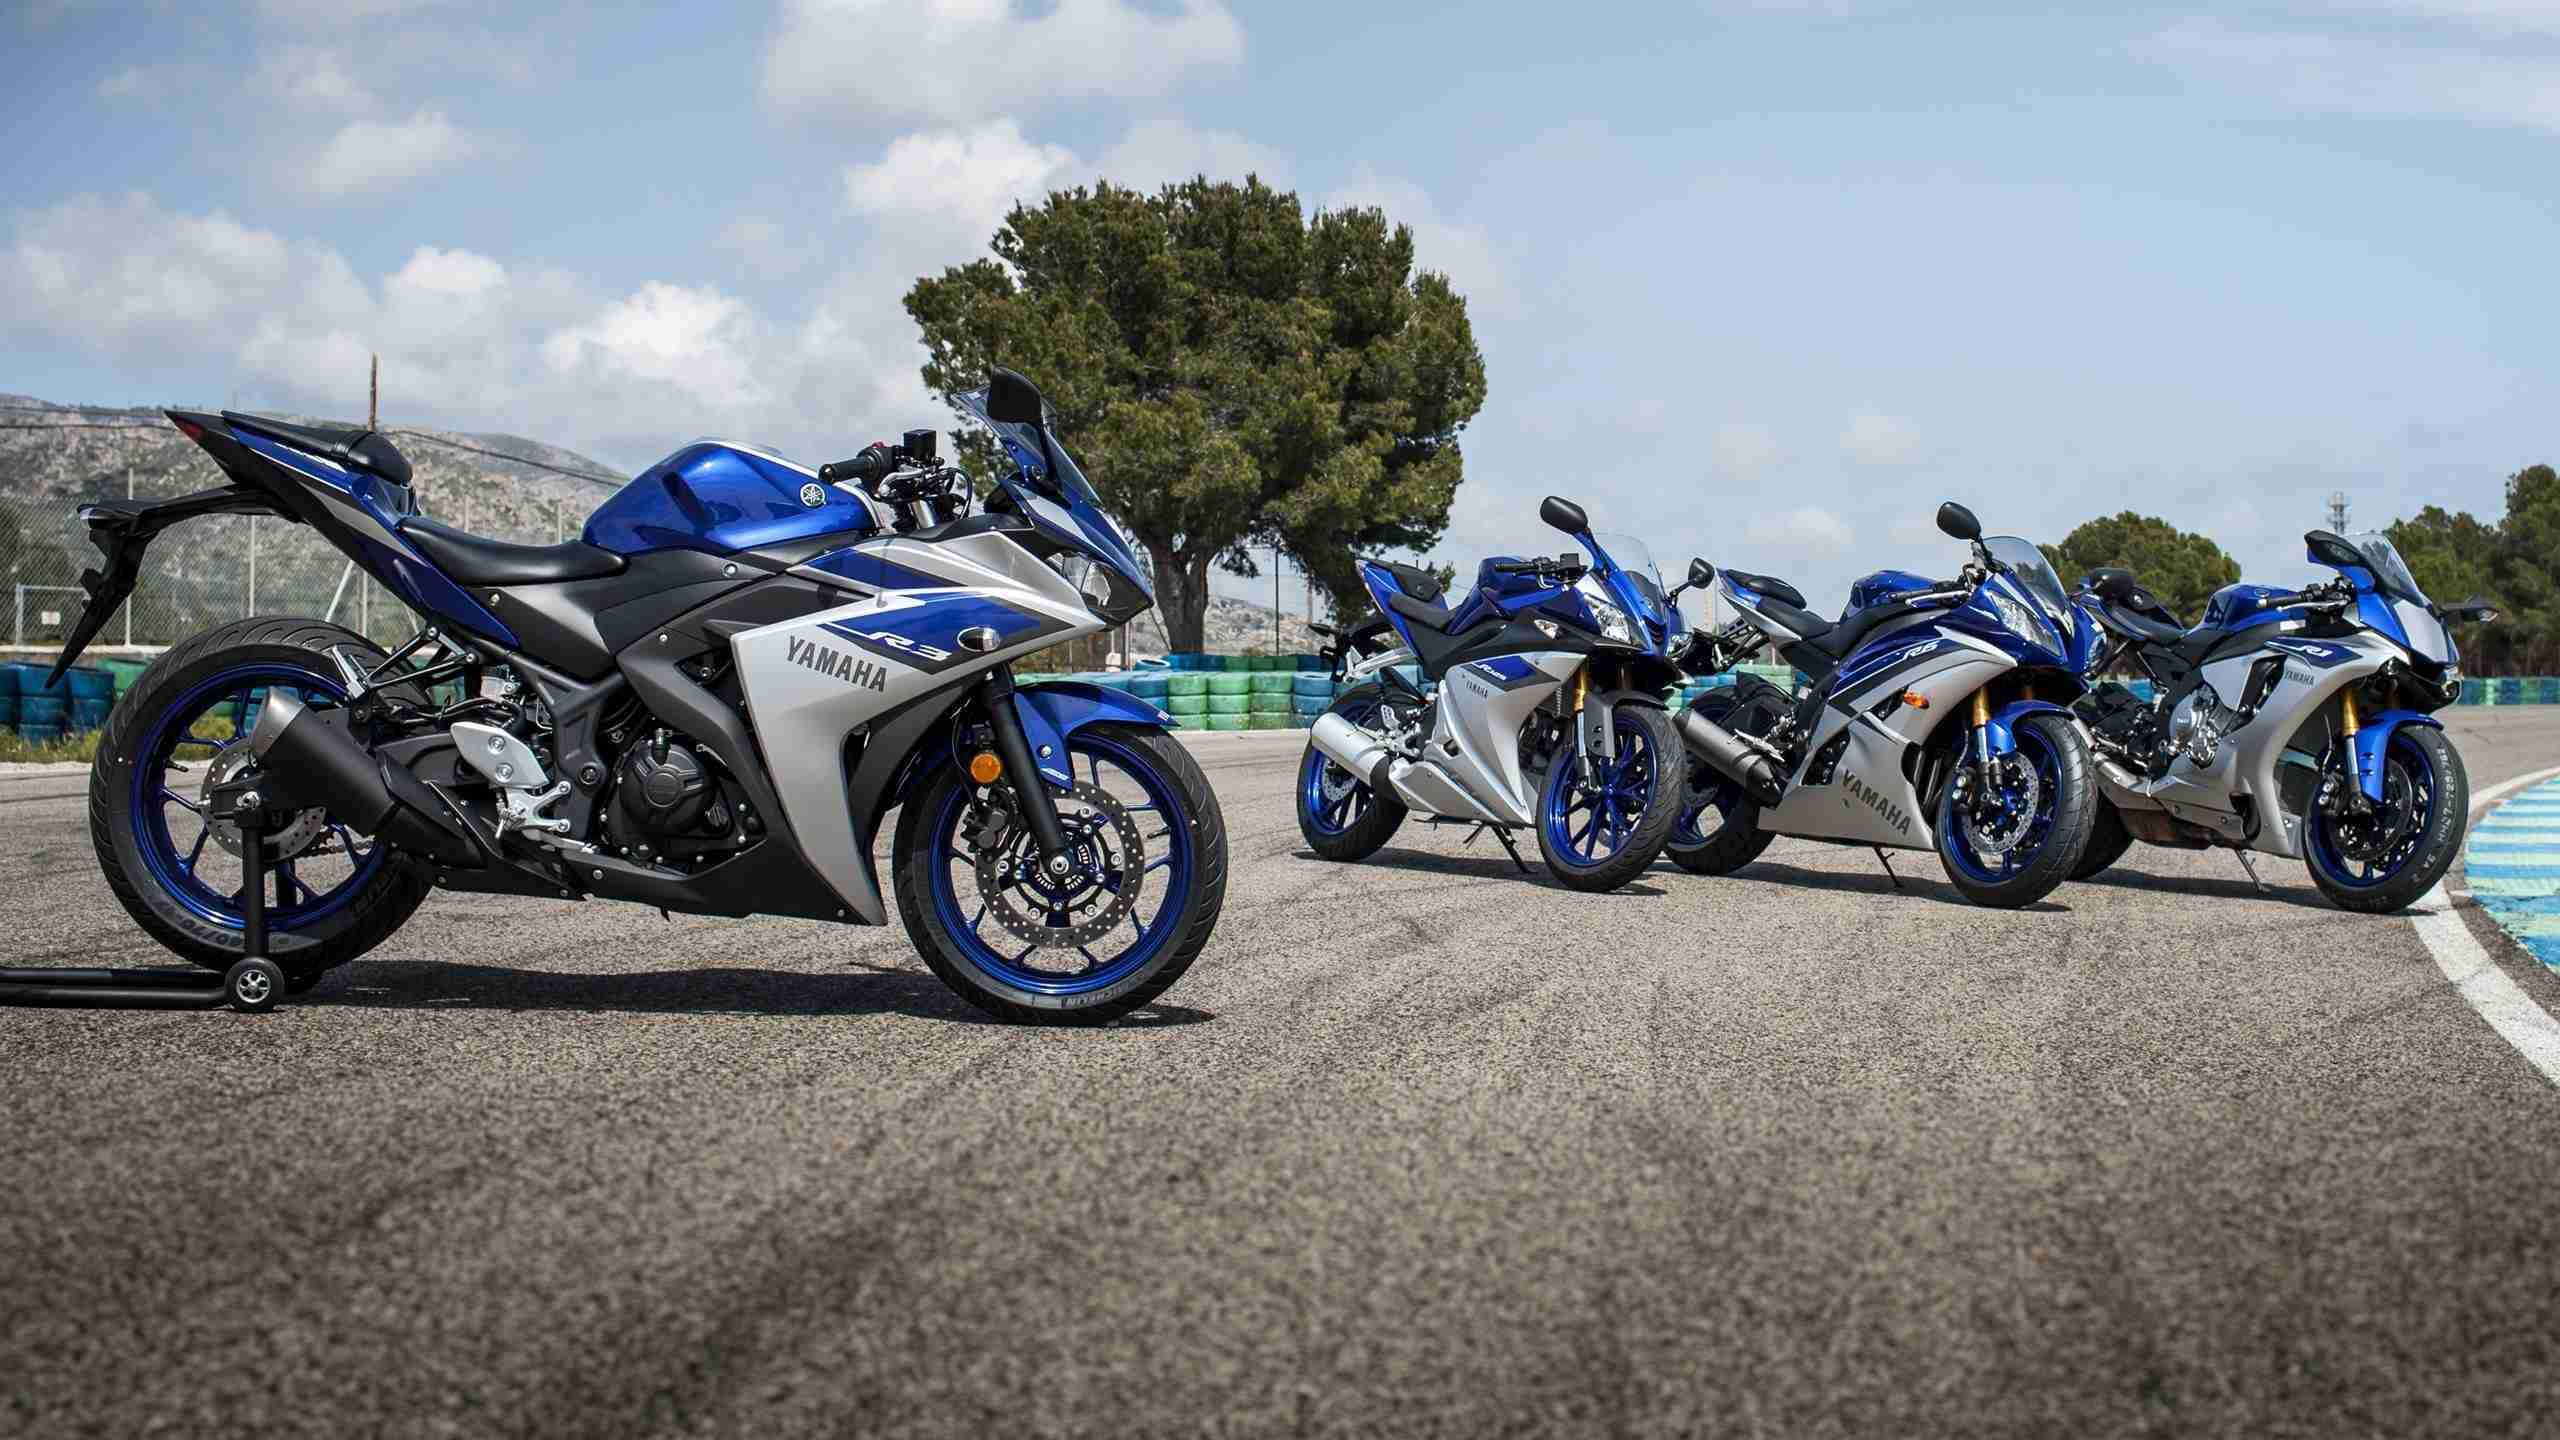 Yamaha R3 along with R125 R6 and R1